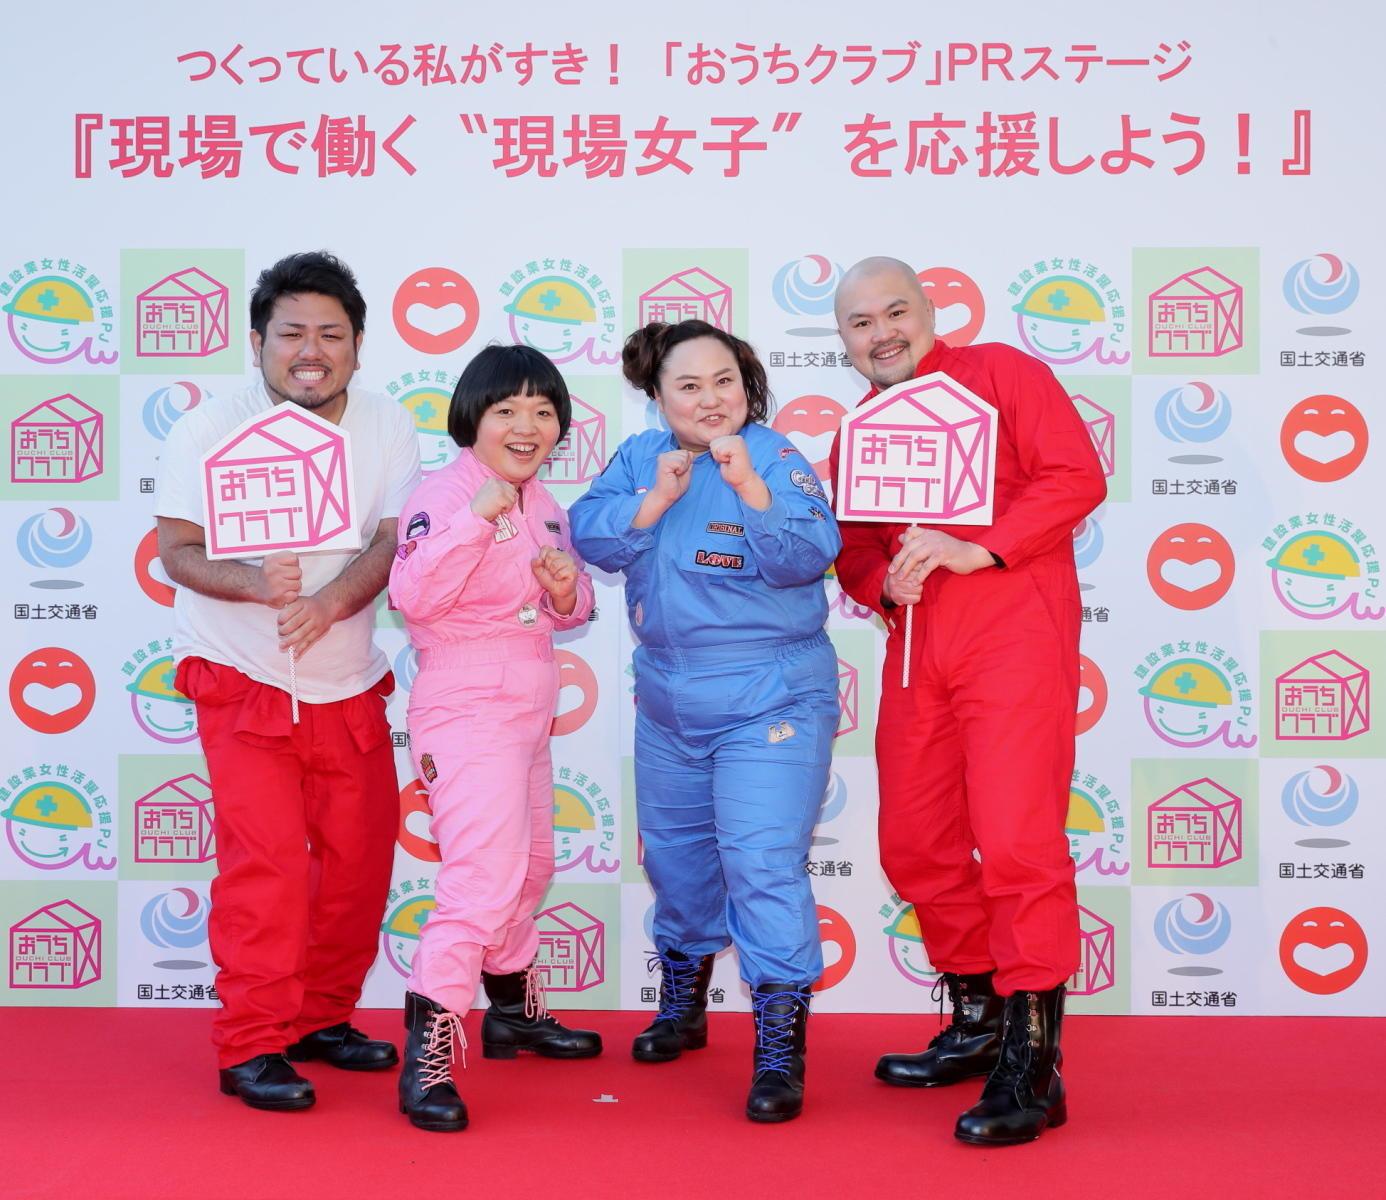 http://news.yoshimoto.co.jp/20170226100622-5a72180f93fdef91b838f404bf8b2fad4d65ea45.jpg